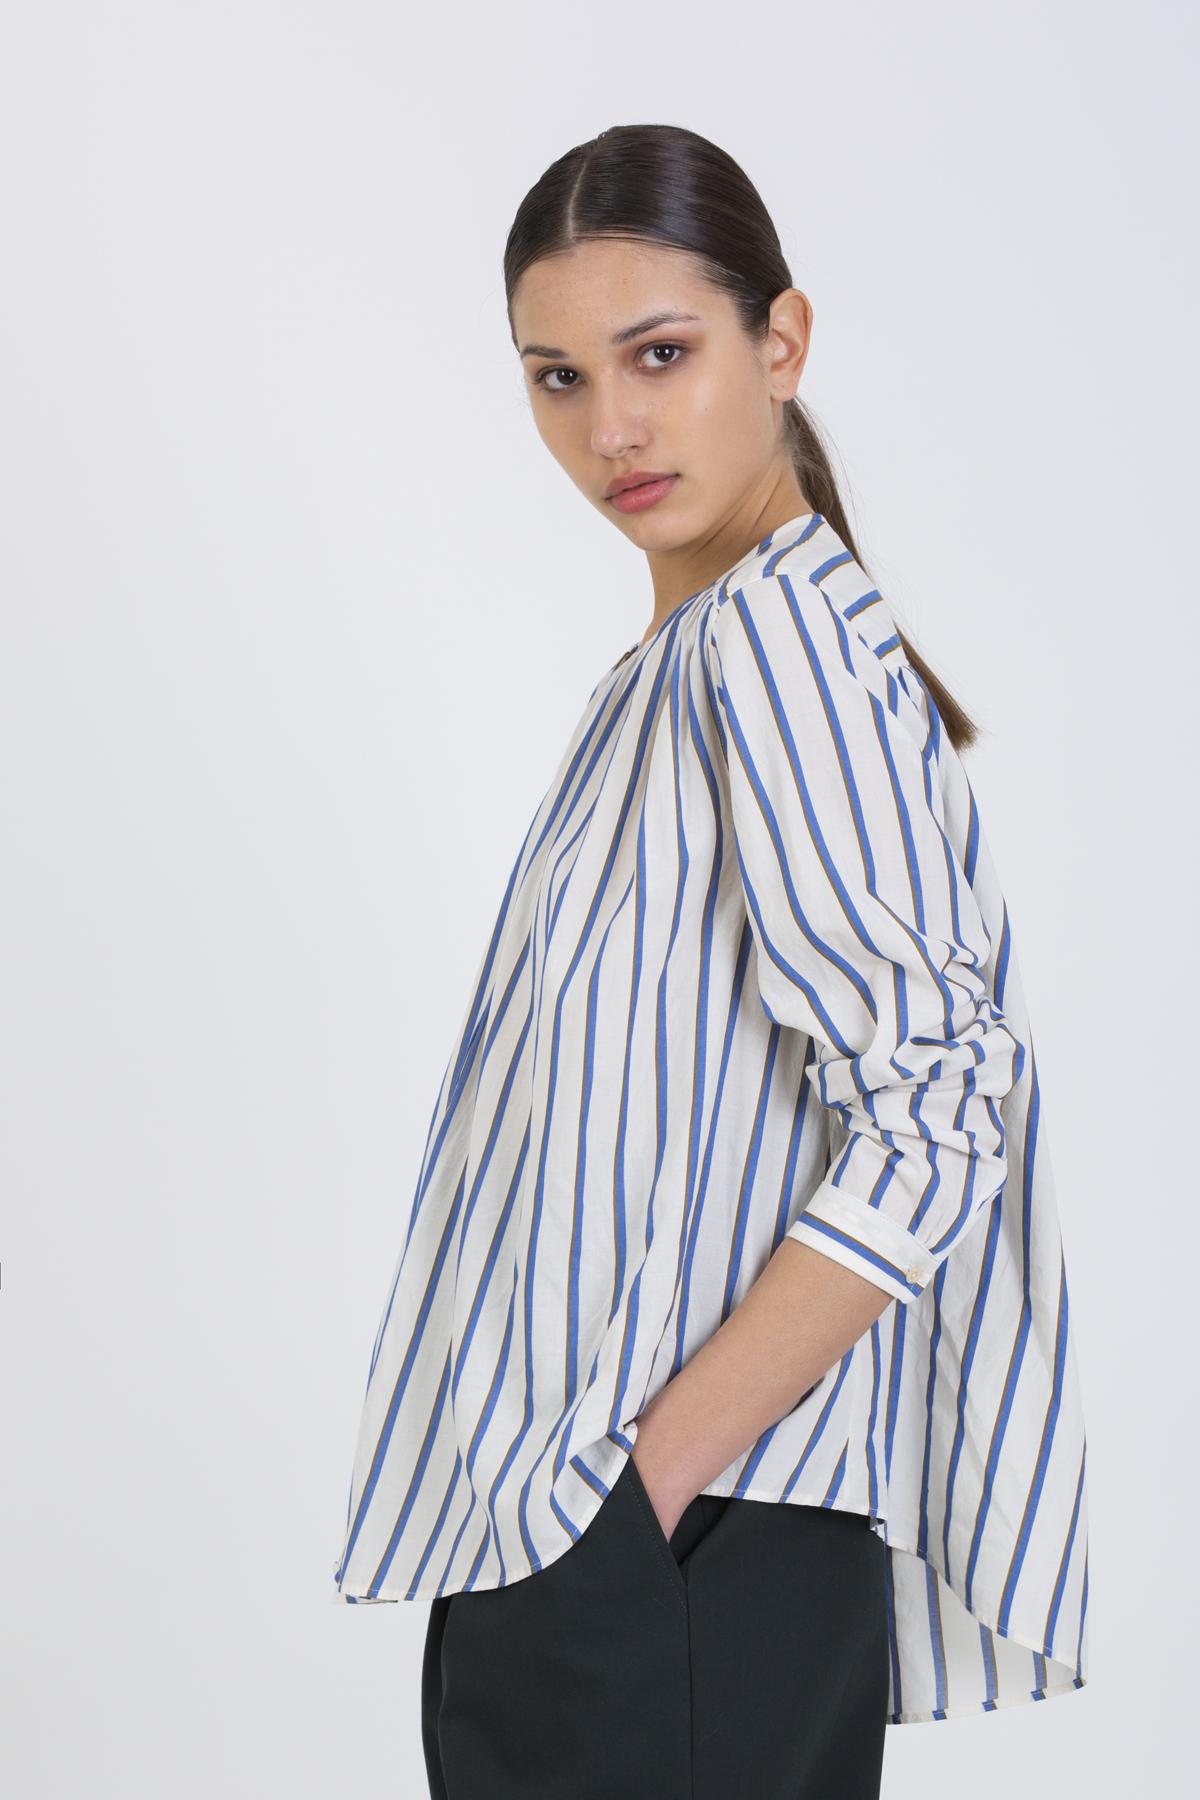 charlie-bobby-stripes-cotton-sacrecoeur-shirt-matchboxathens